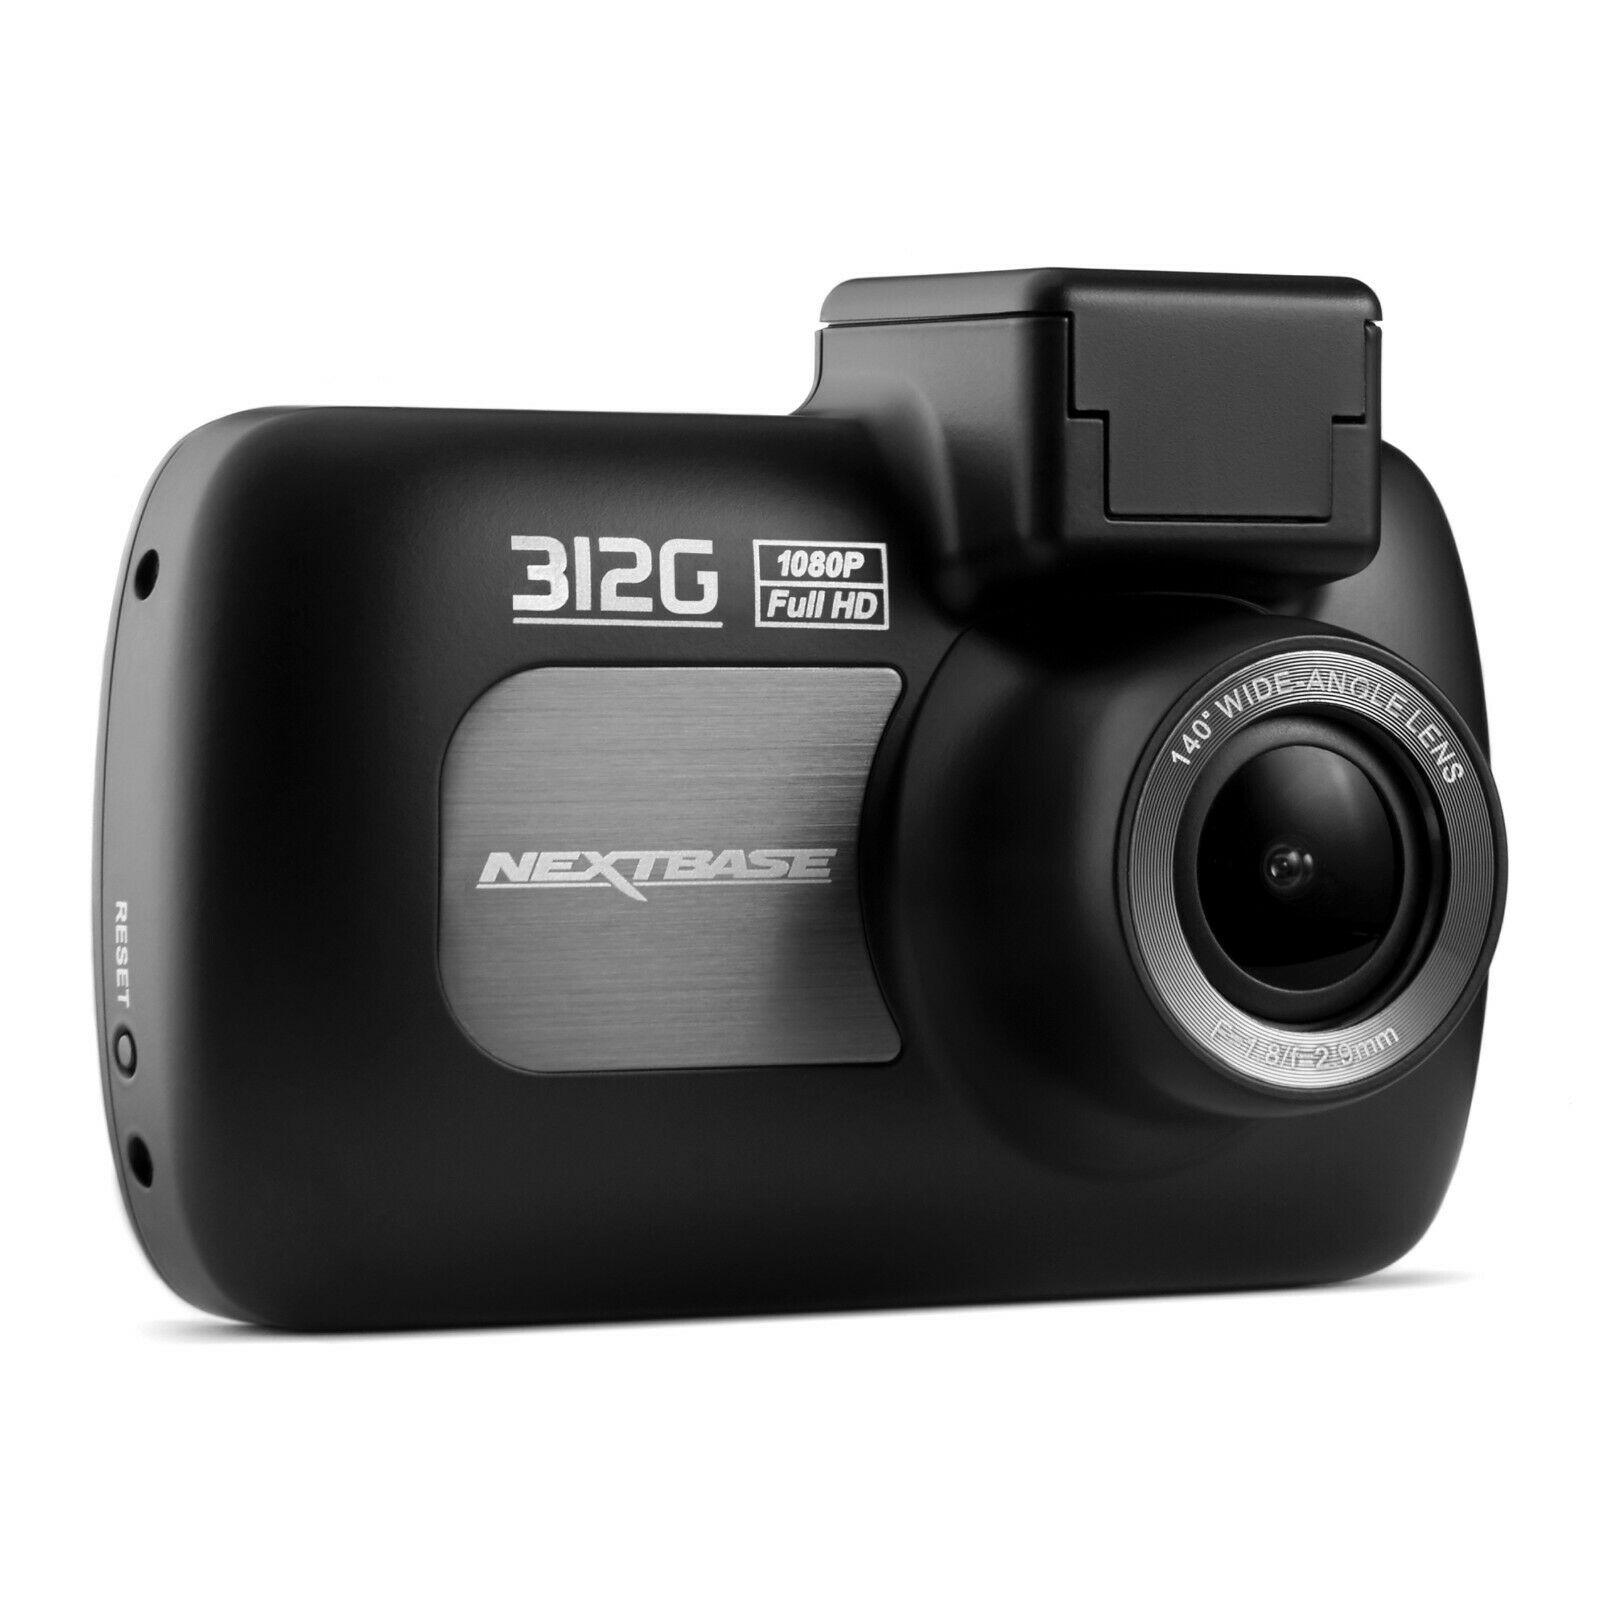 "Nextbase 312G Dash Cam 1080P 2.7"" LED Car Recorder Night Vision £45 with code @ velocityelectronics  / ebay"